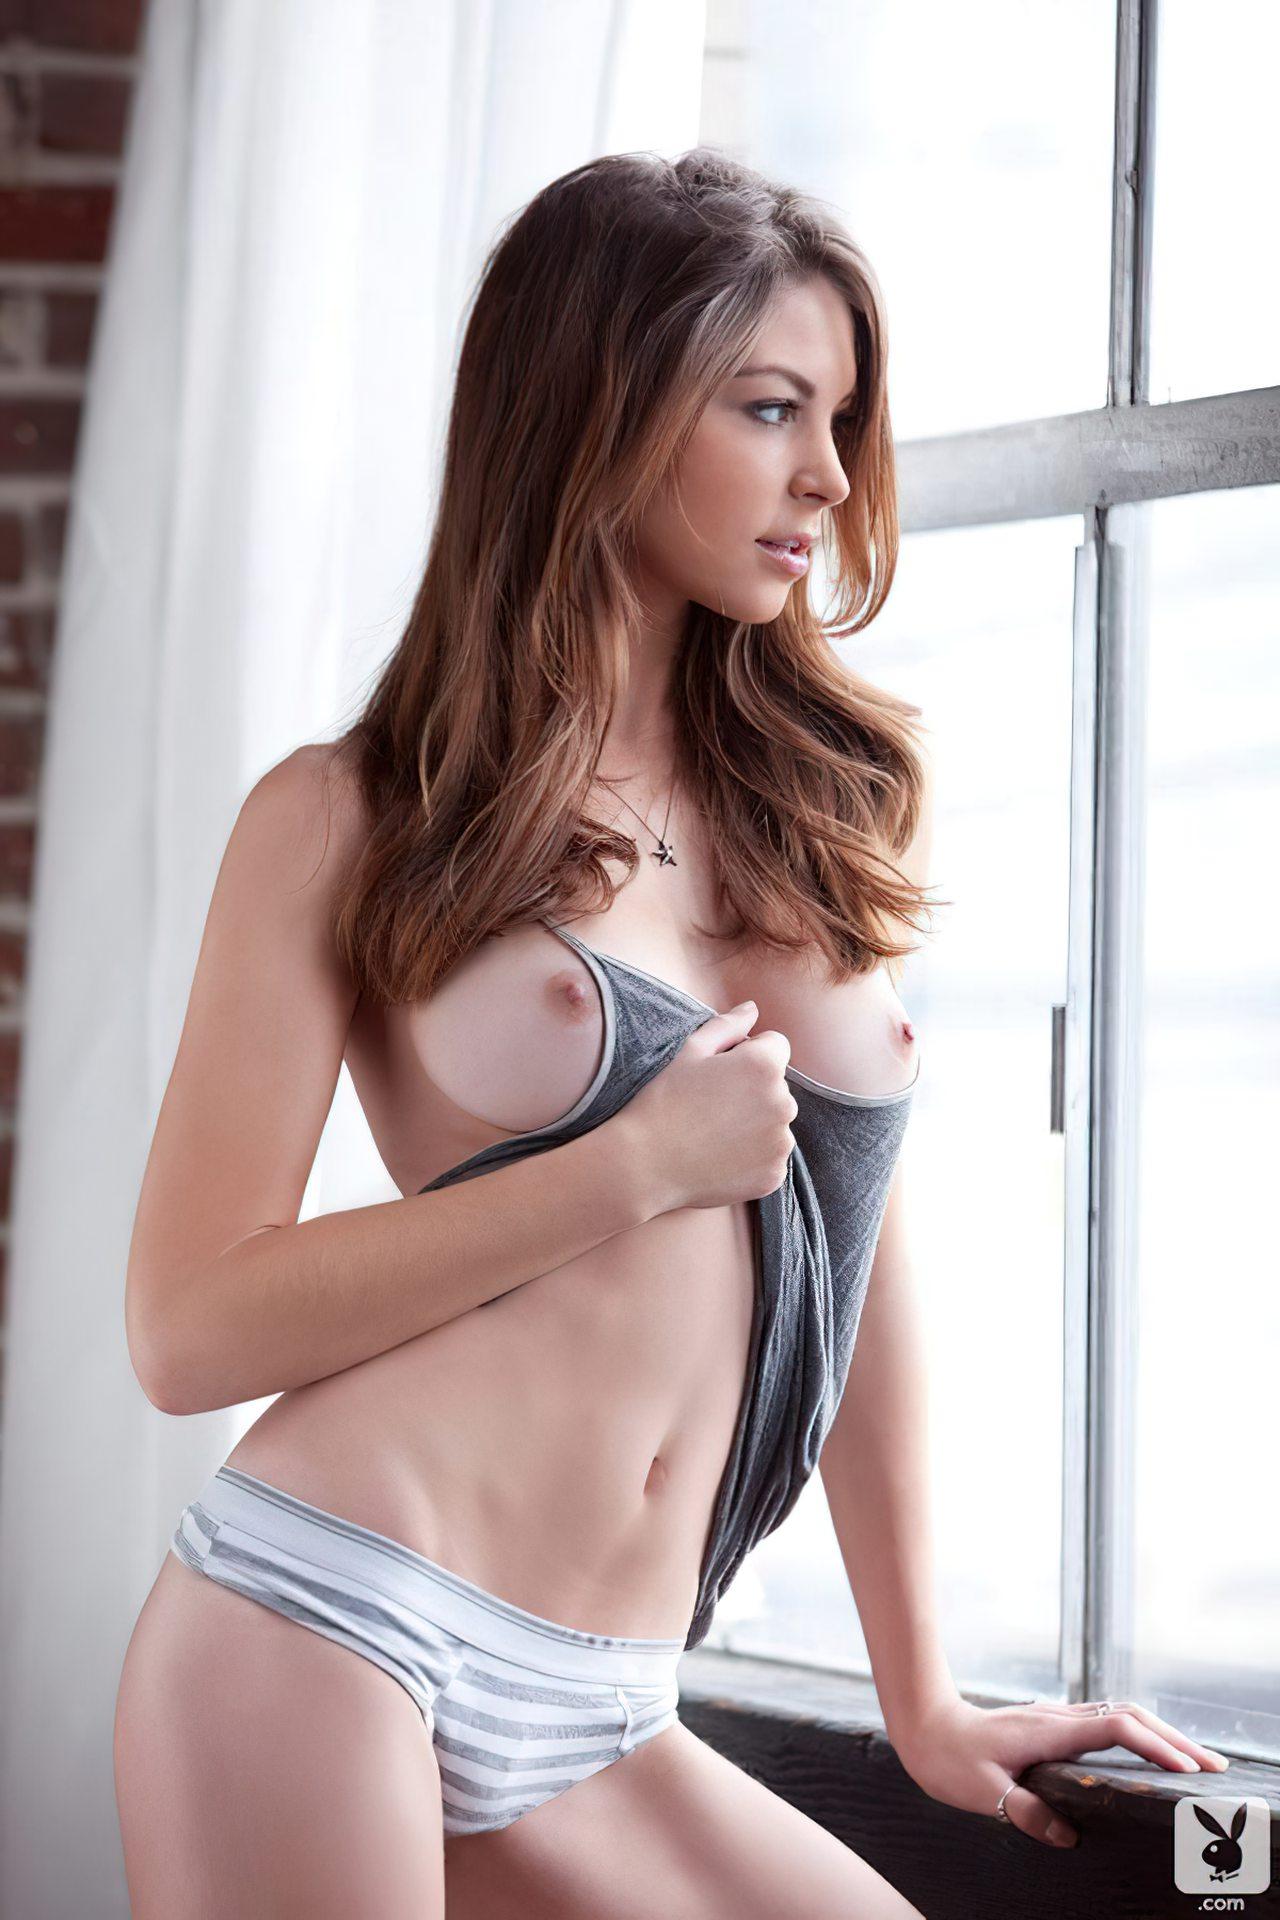 Modelo da Playboy